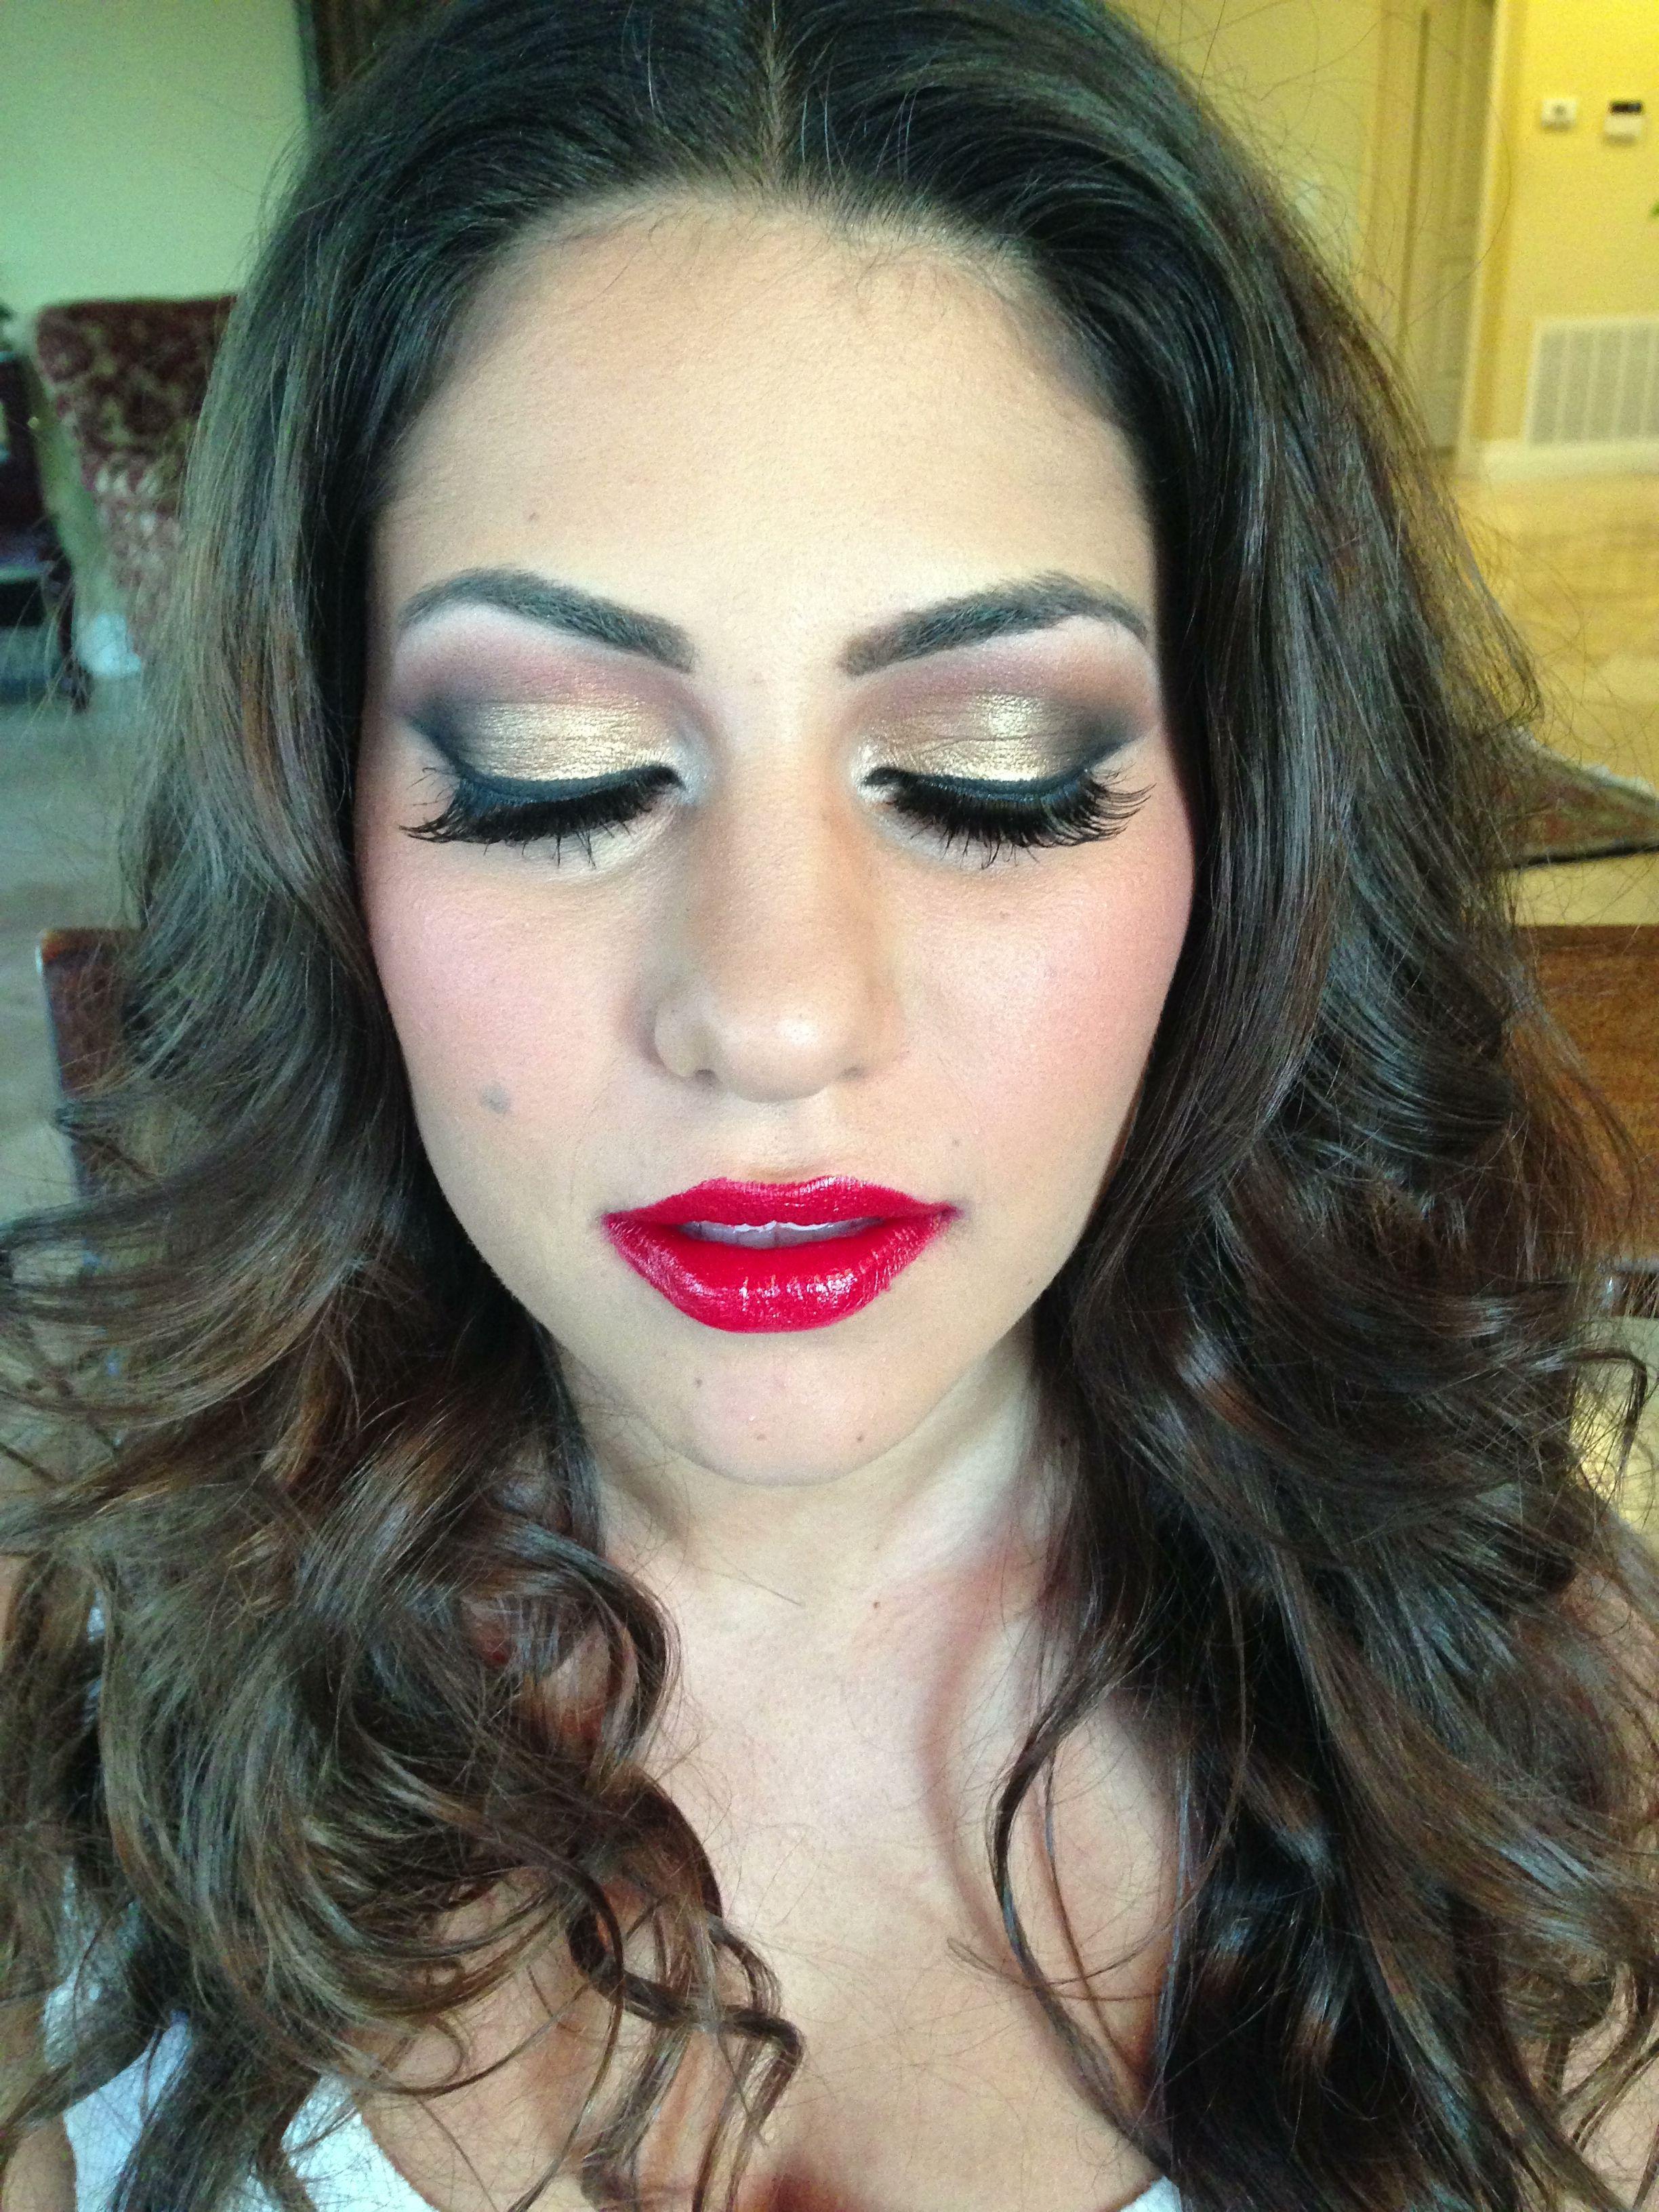 Hollywood glam - make up by Krystal Hanna